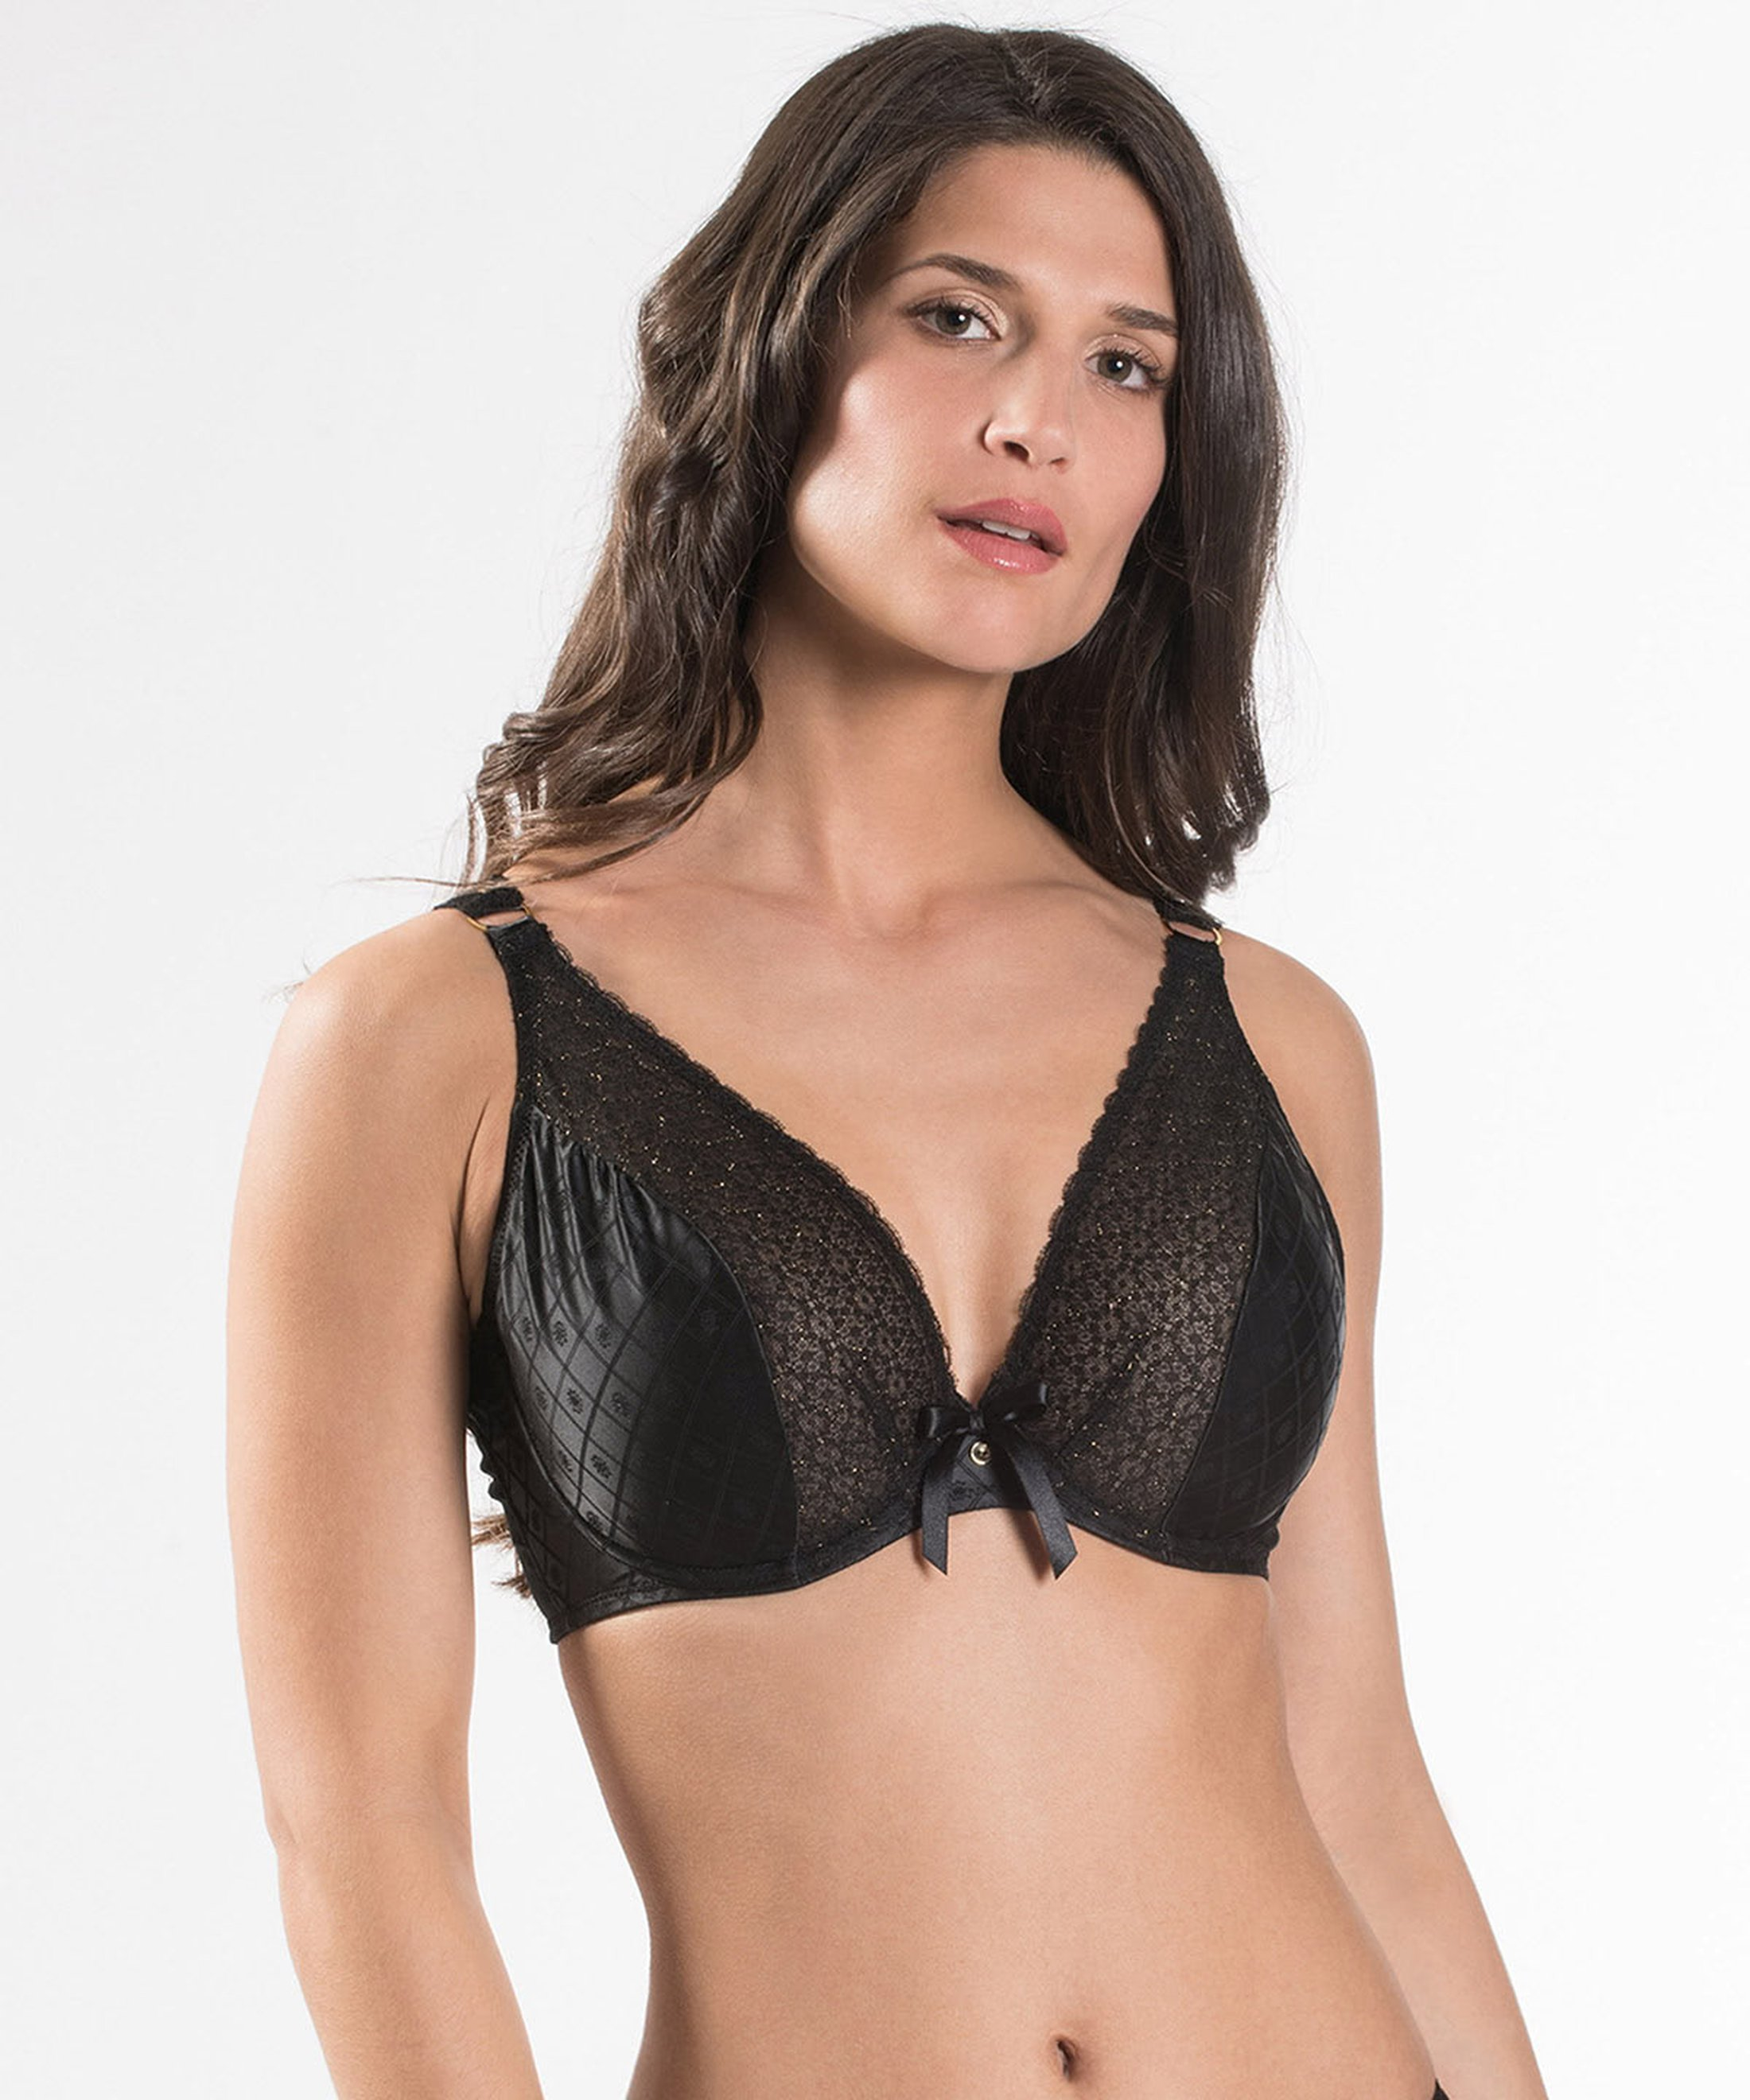 FEMME AUBADE Comfort triangle plunge bra Black | Aubade